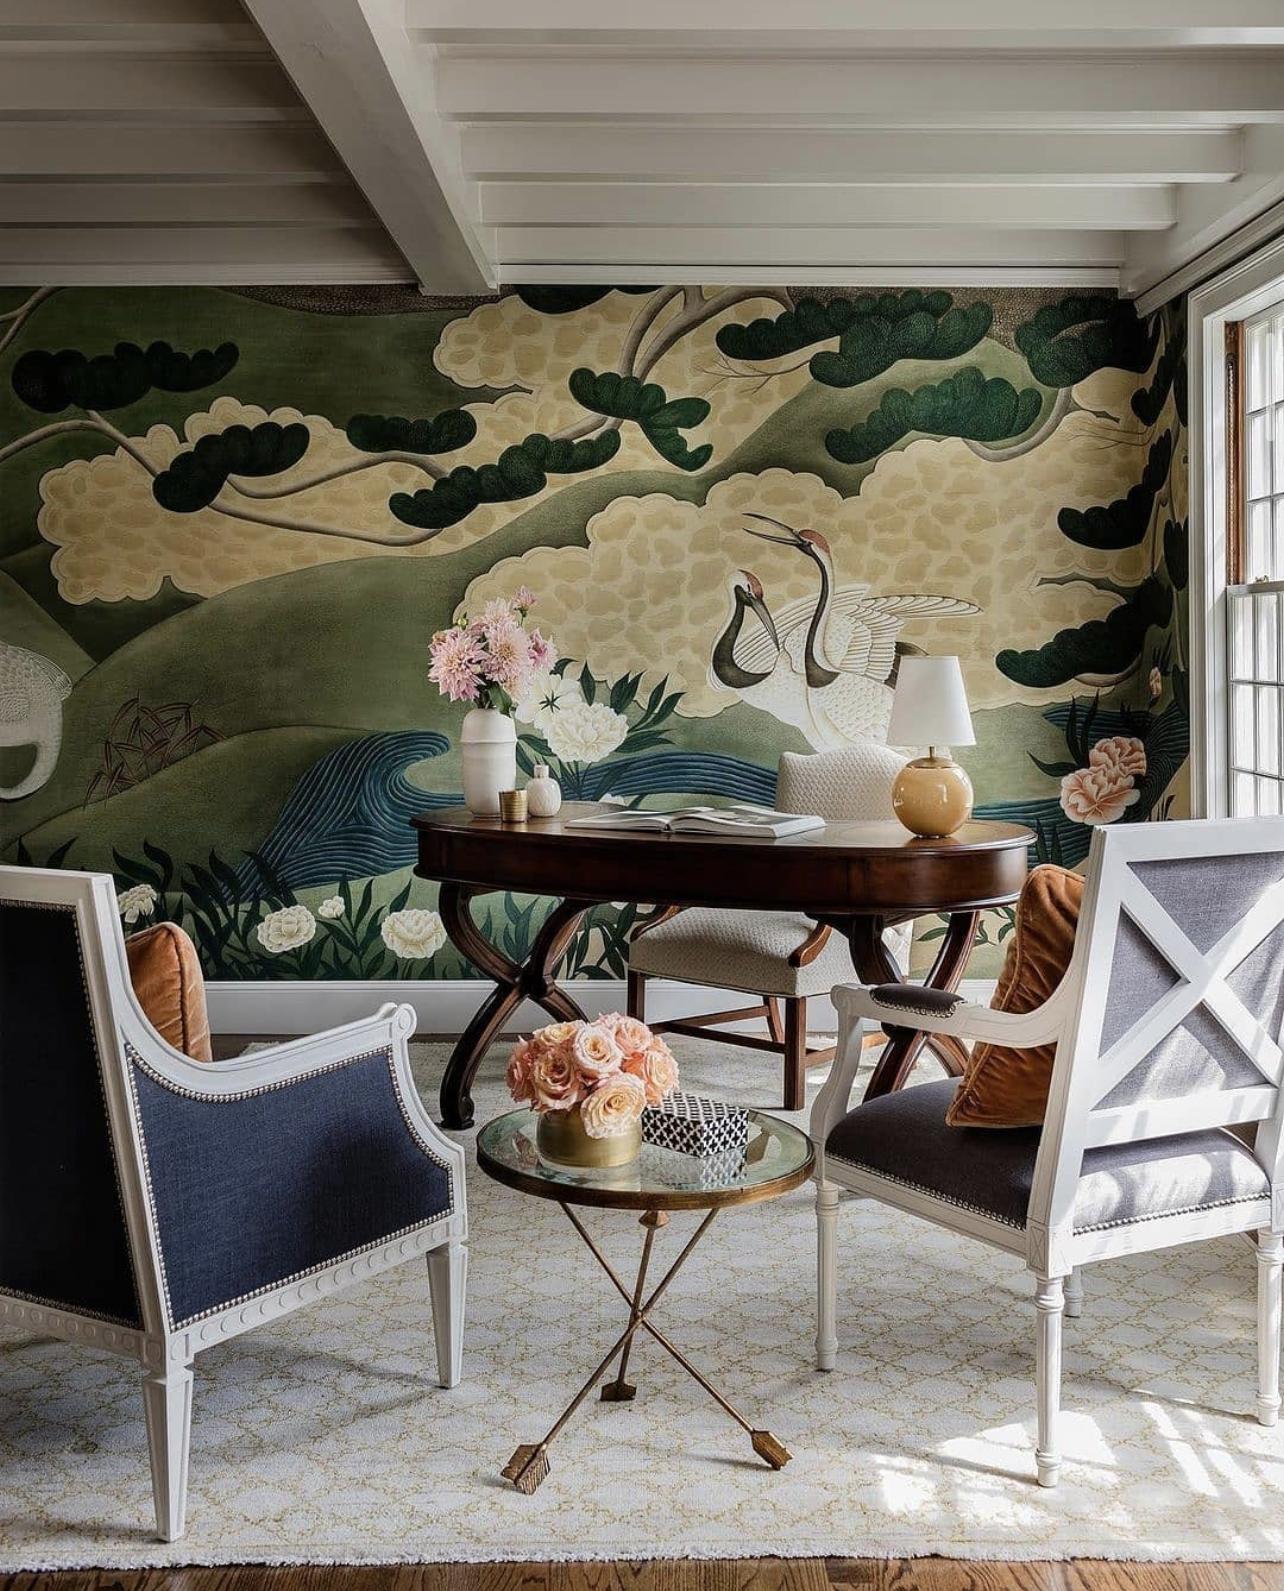 Schumacher In 2021 Decor Home Decor Traditional Wallpaper